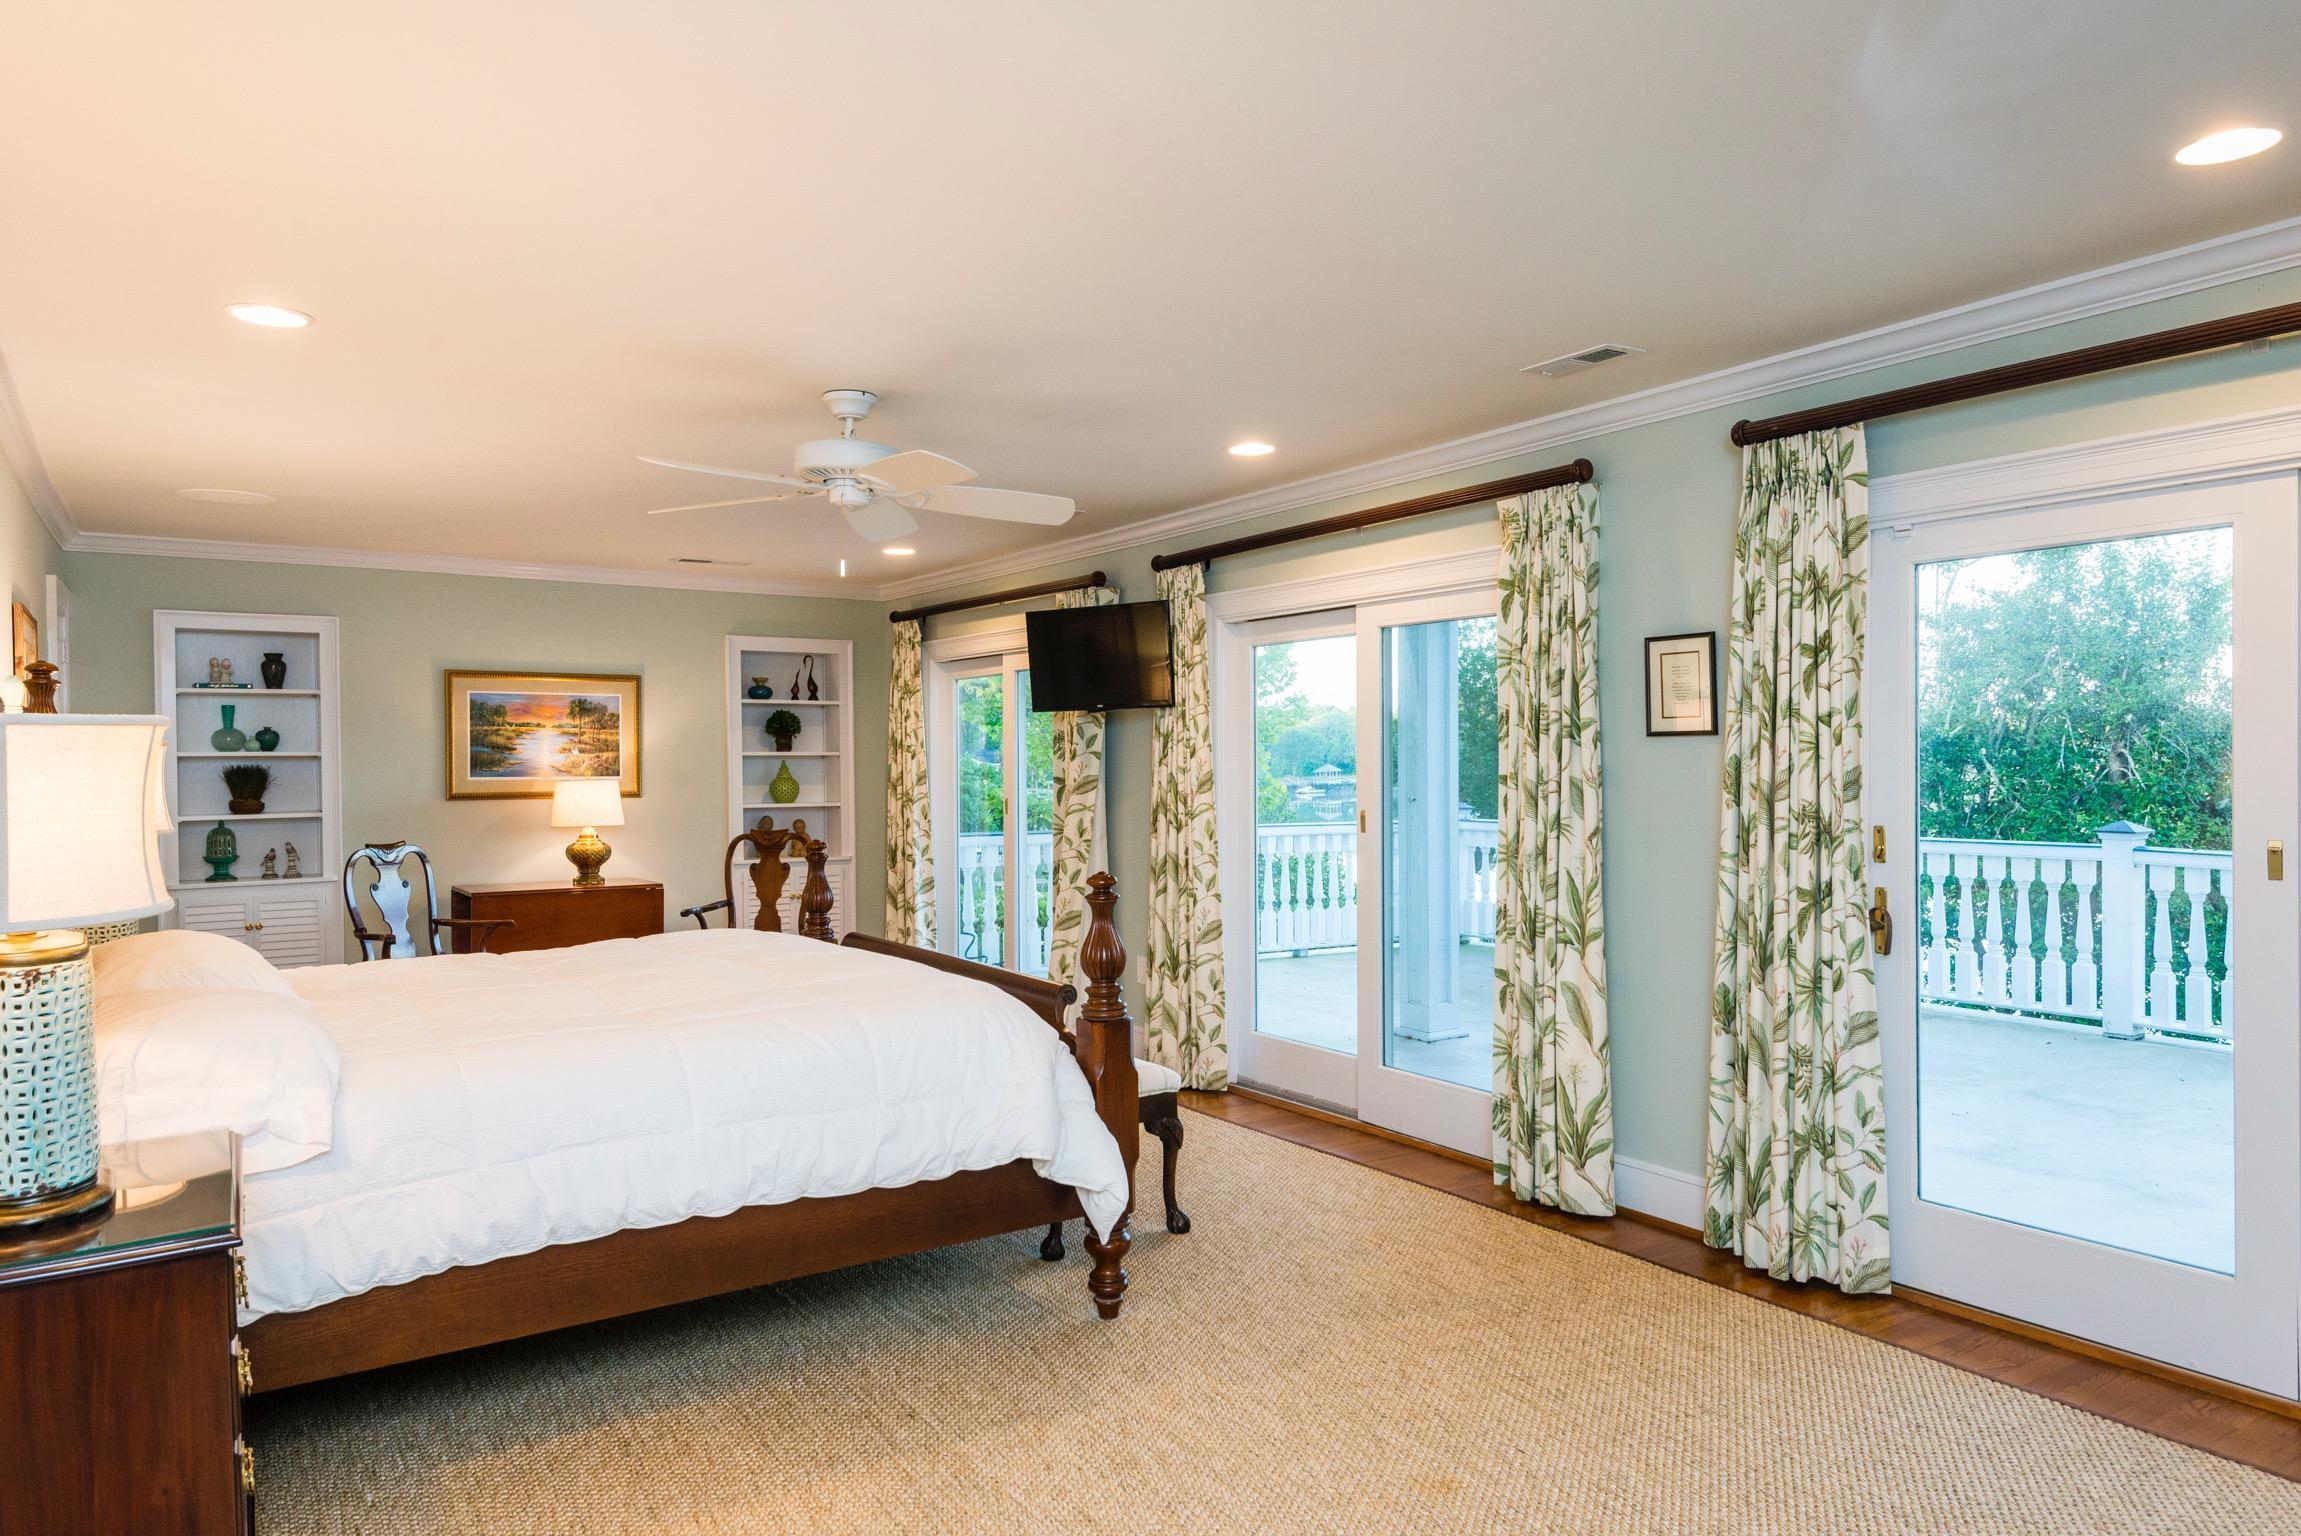 Lawton Bluff Homes For Sale - 685 Shore, Charleston, SC - 21